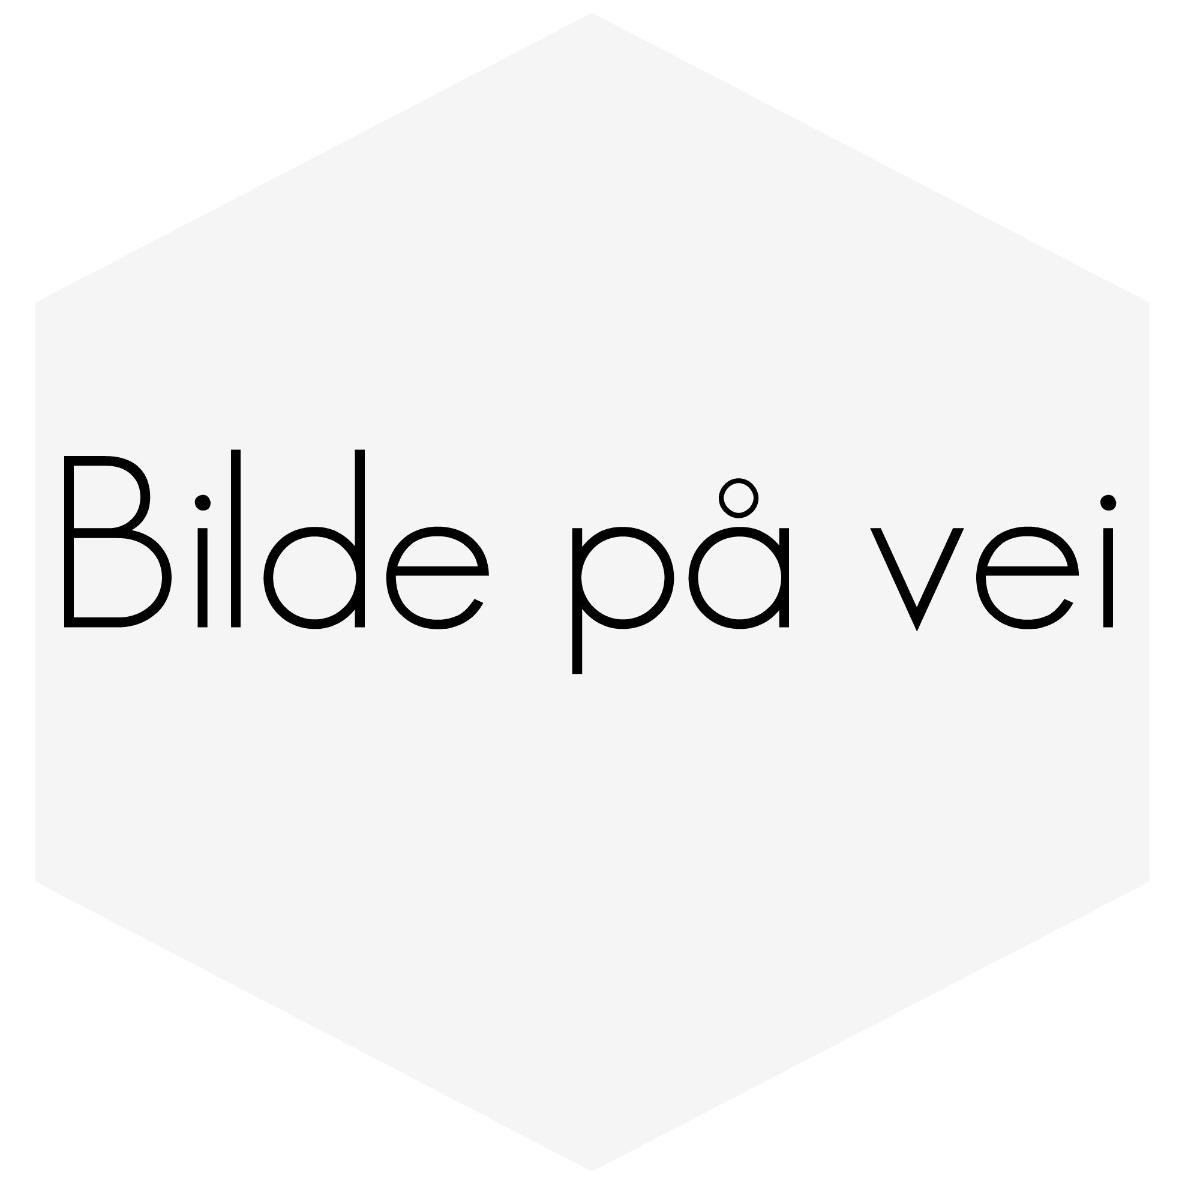 SILIKONSLANGE TILLEGGSATS VOLVO 240 VARMEAPR. OG EX.TANK BLÅ